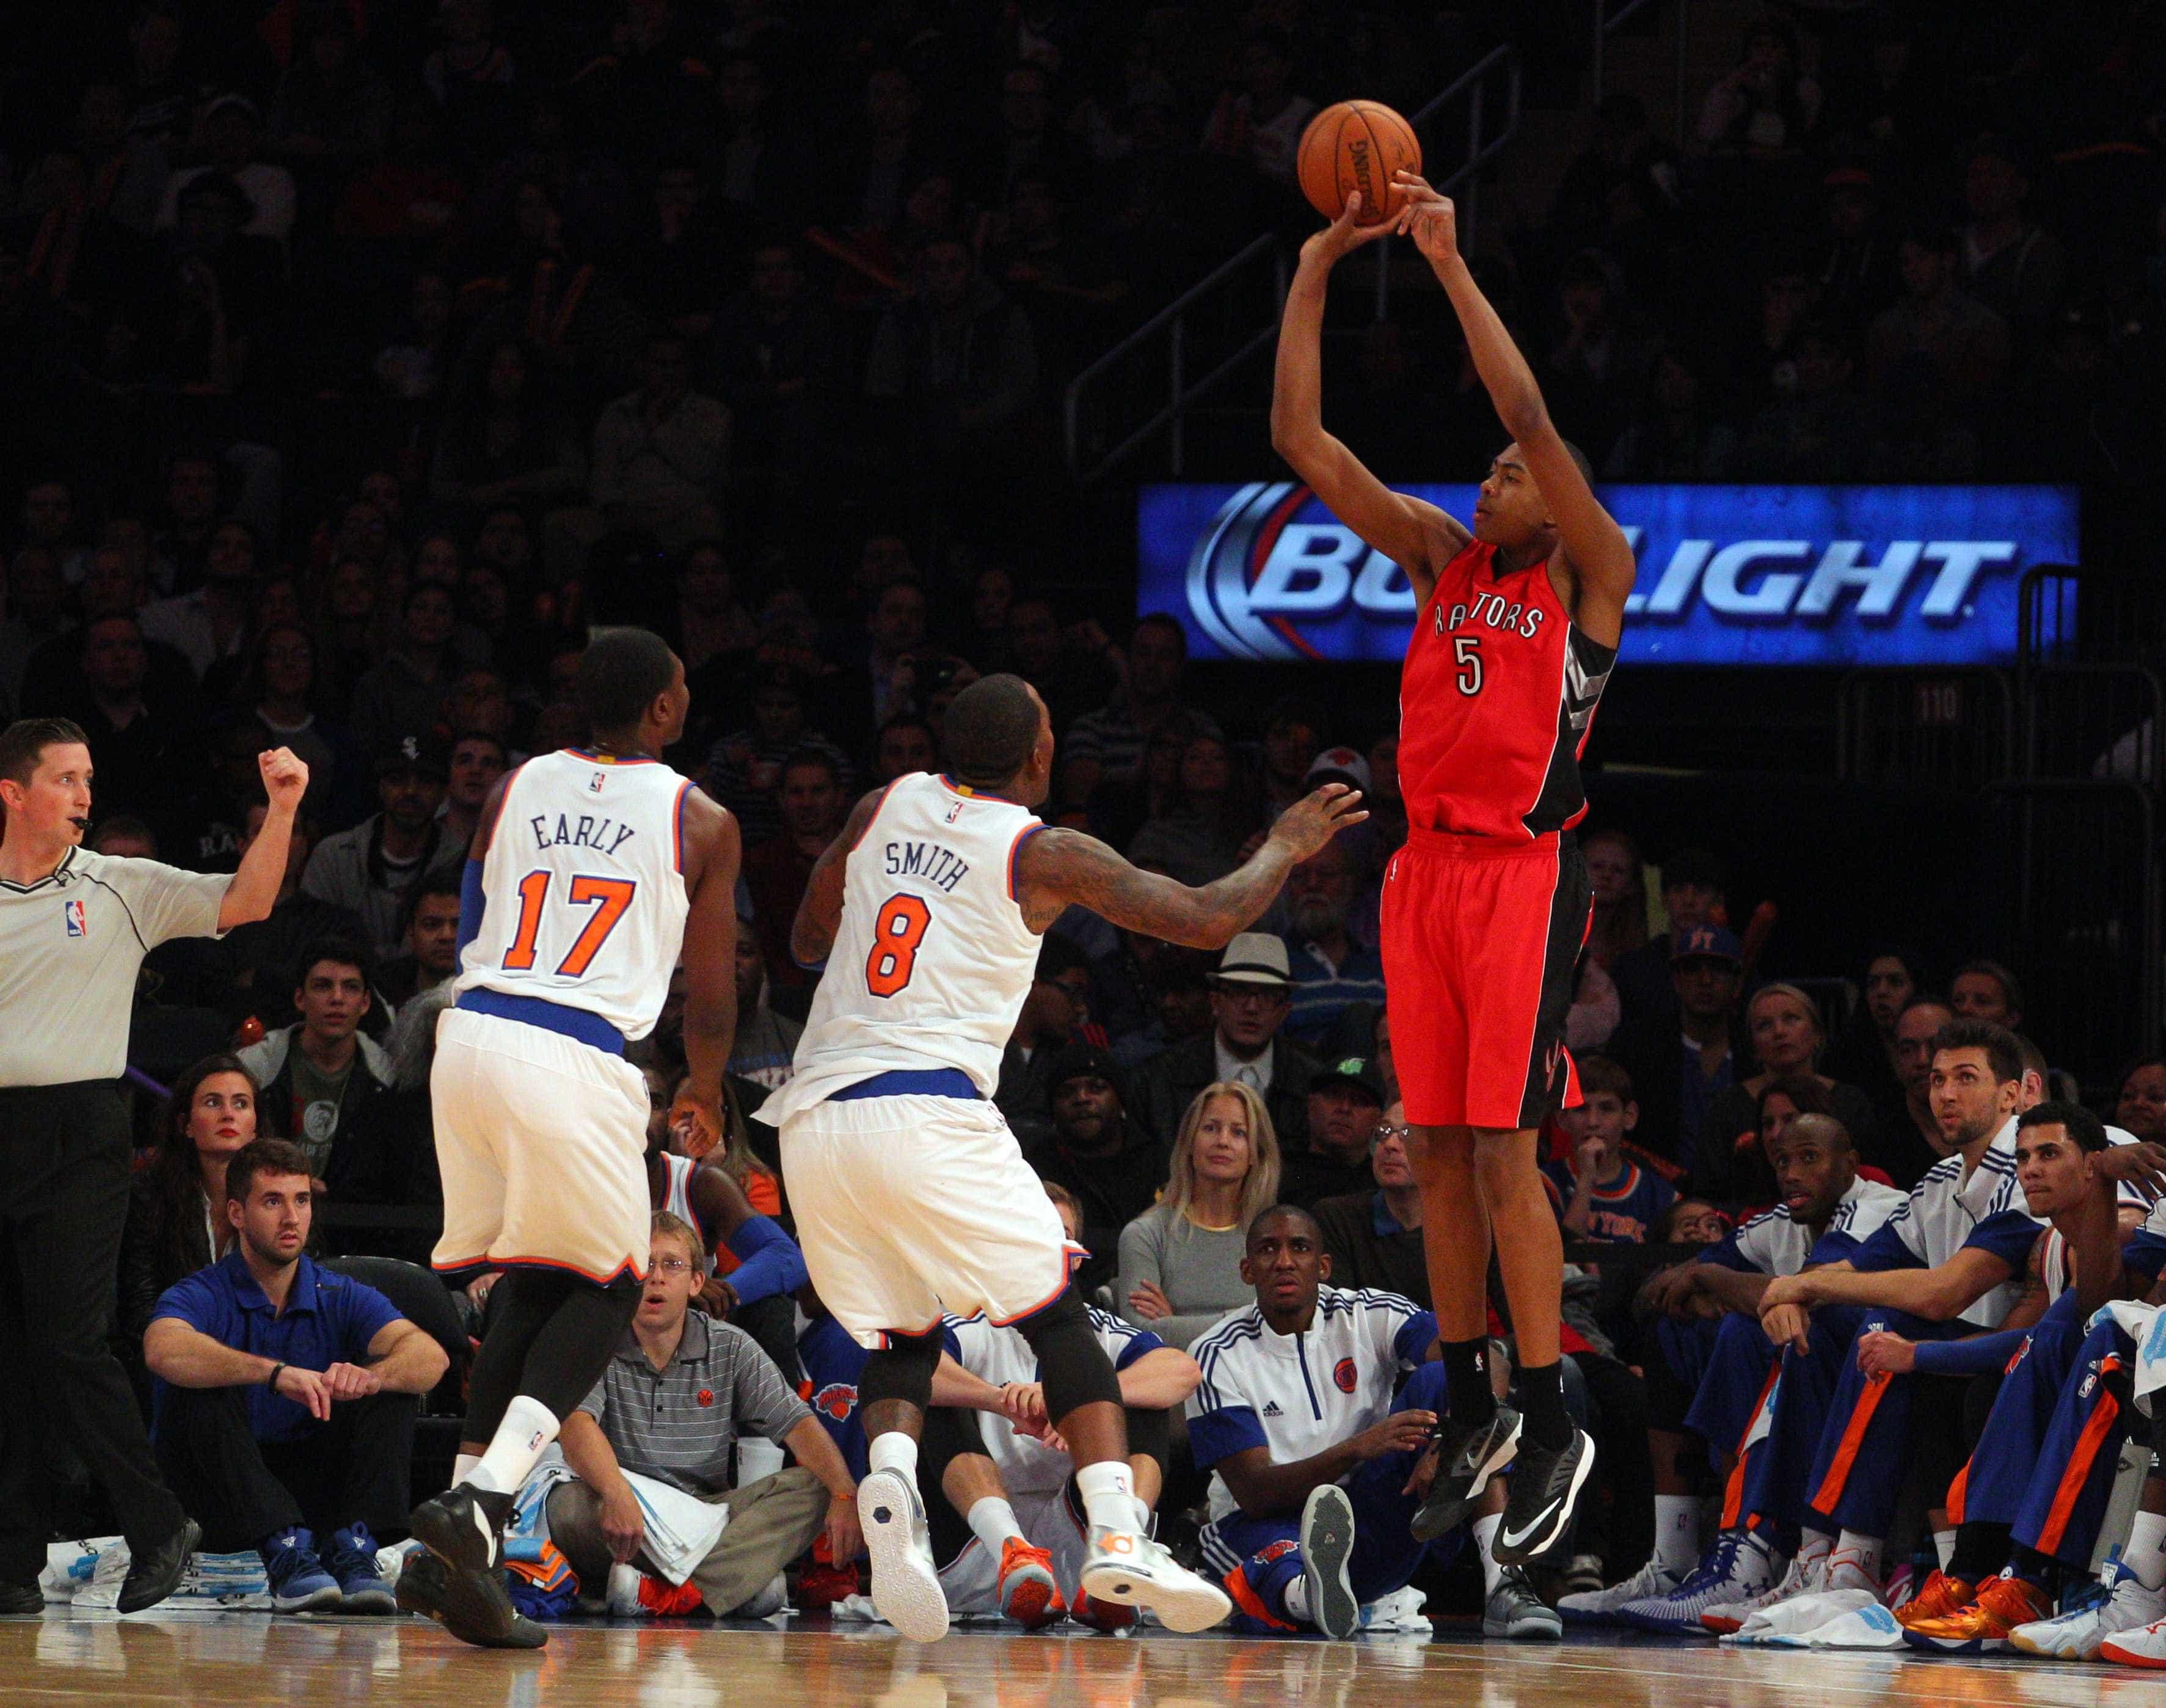 Houston Rockets dispensa brasileiro da NBA, diz jornal americano